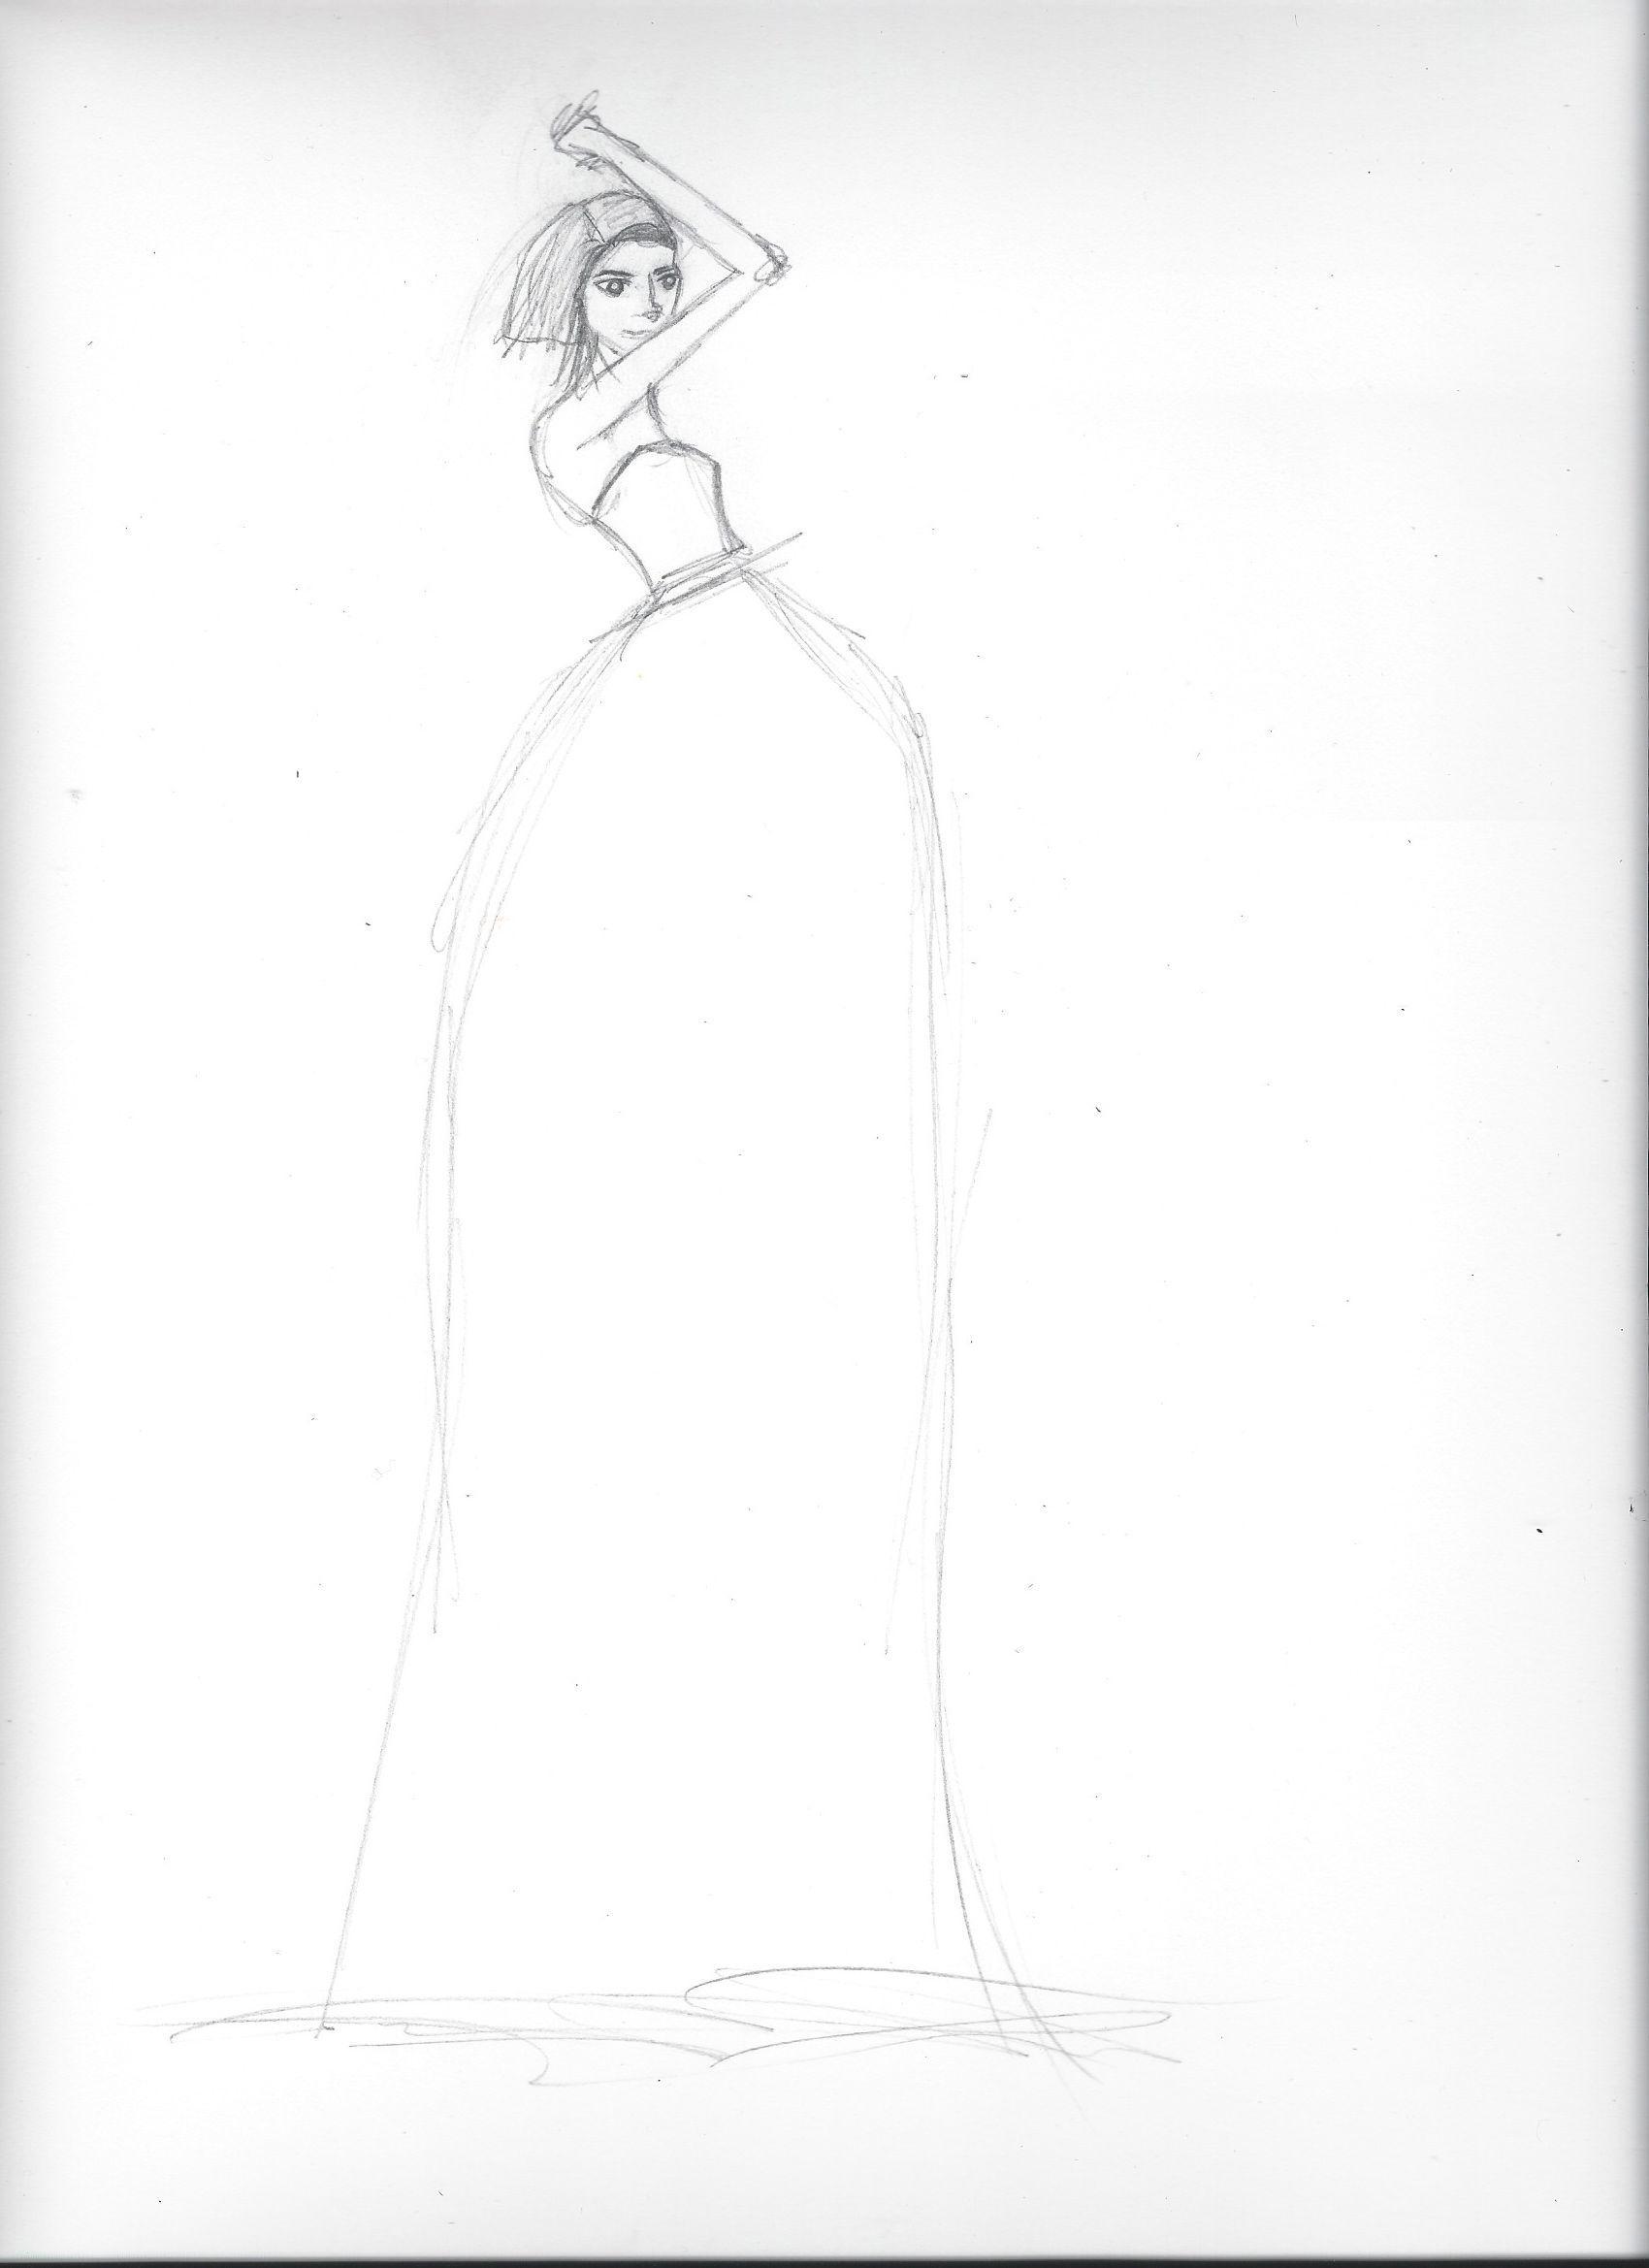 FINAL embellishment/watercolor Melissa Nadine fashion illustration - image 8 - student project